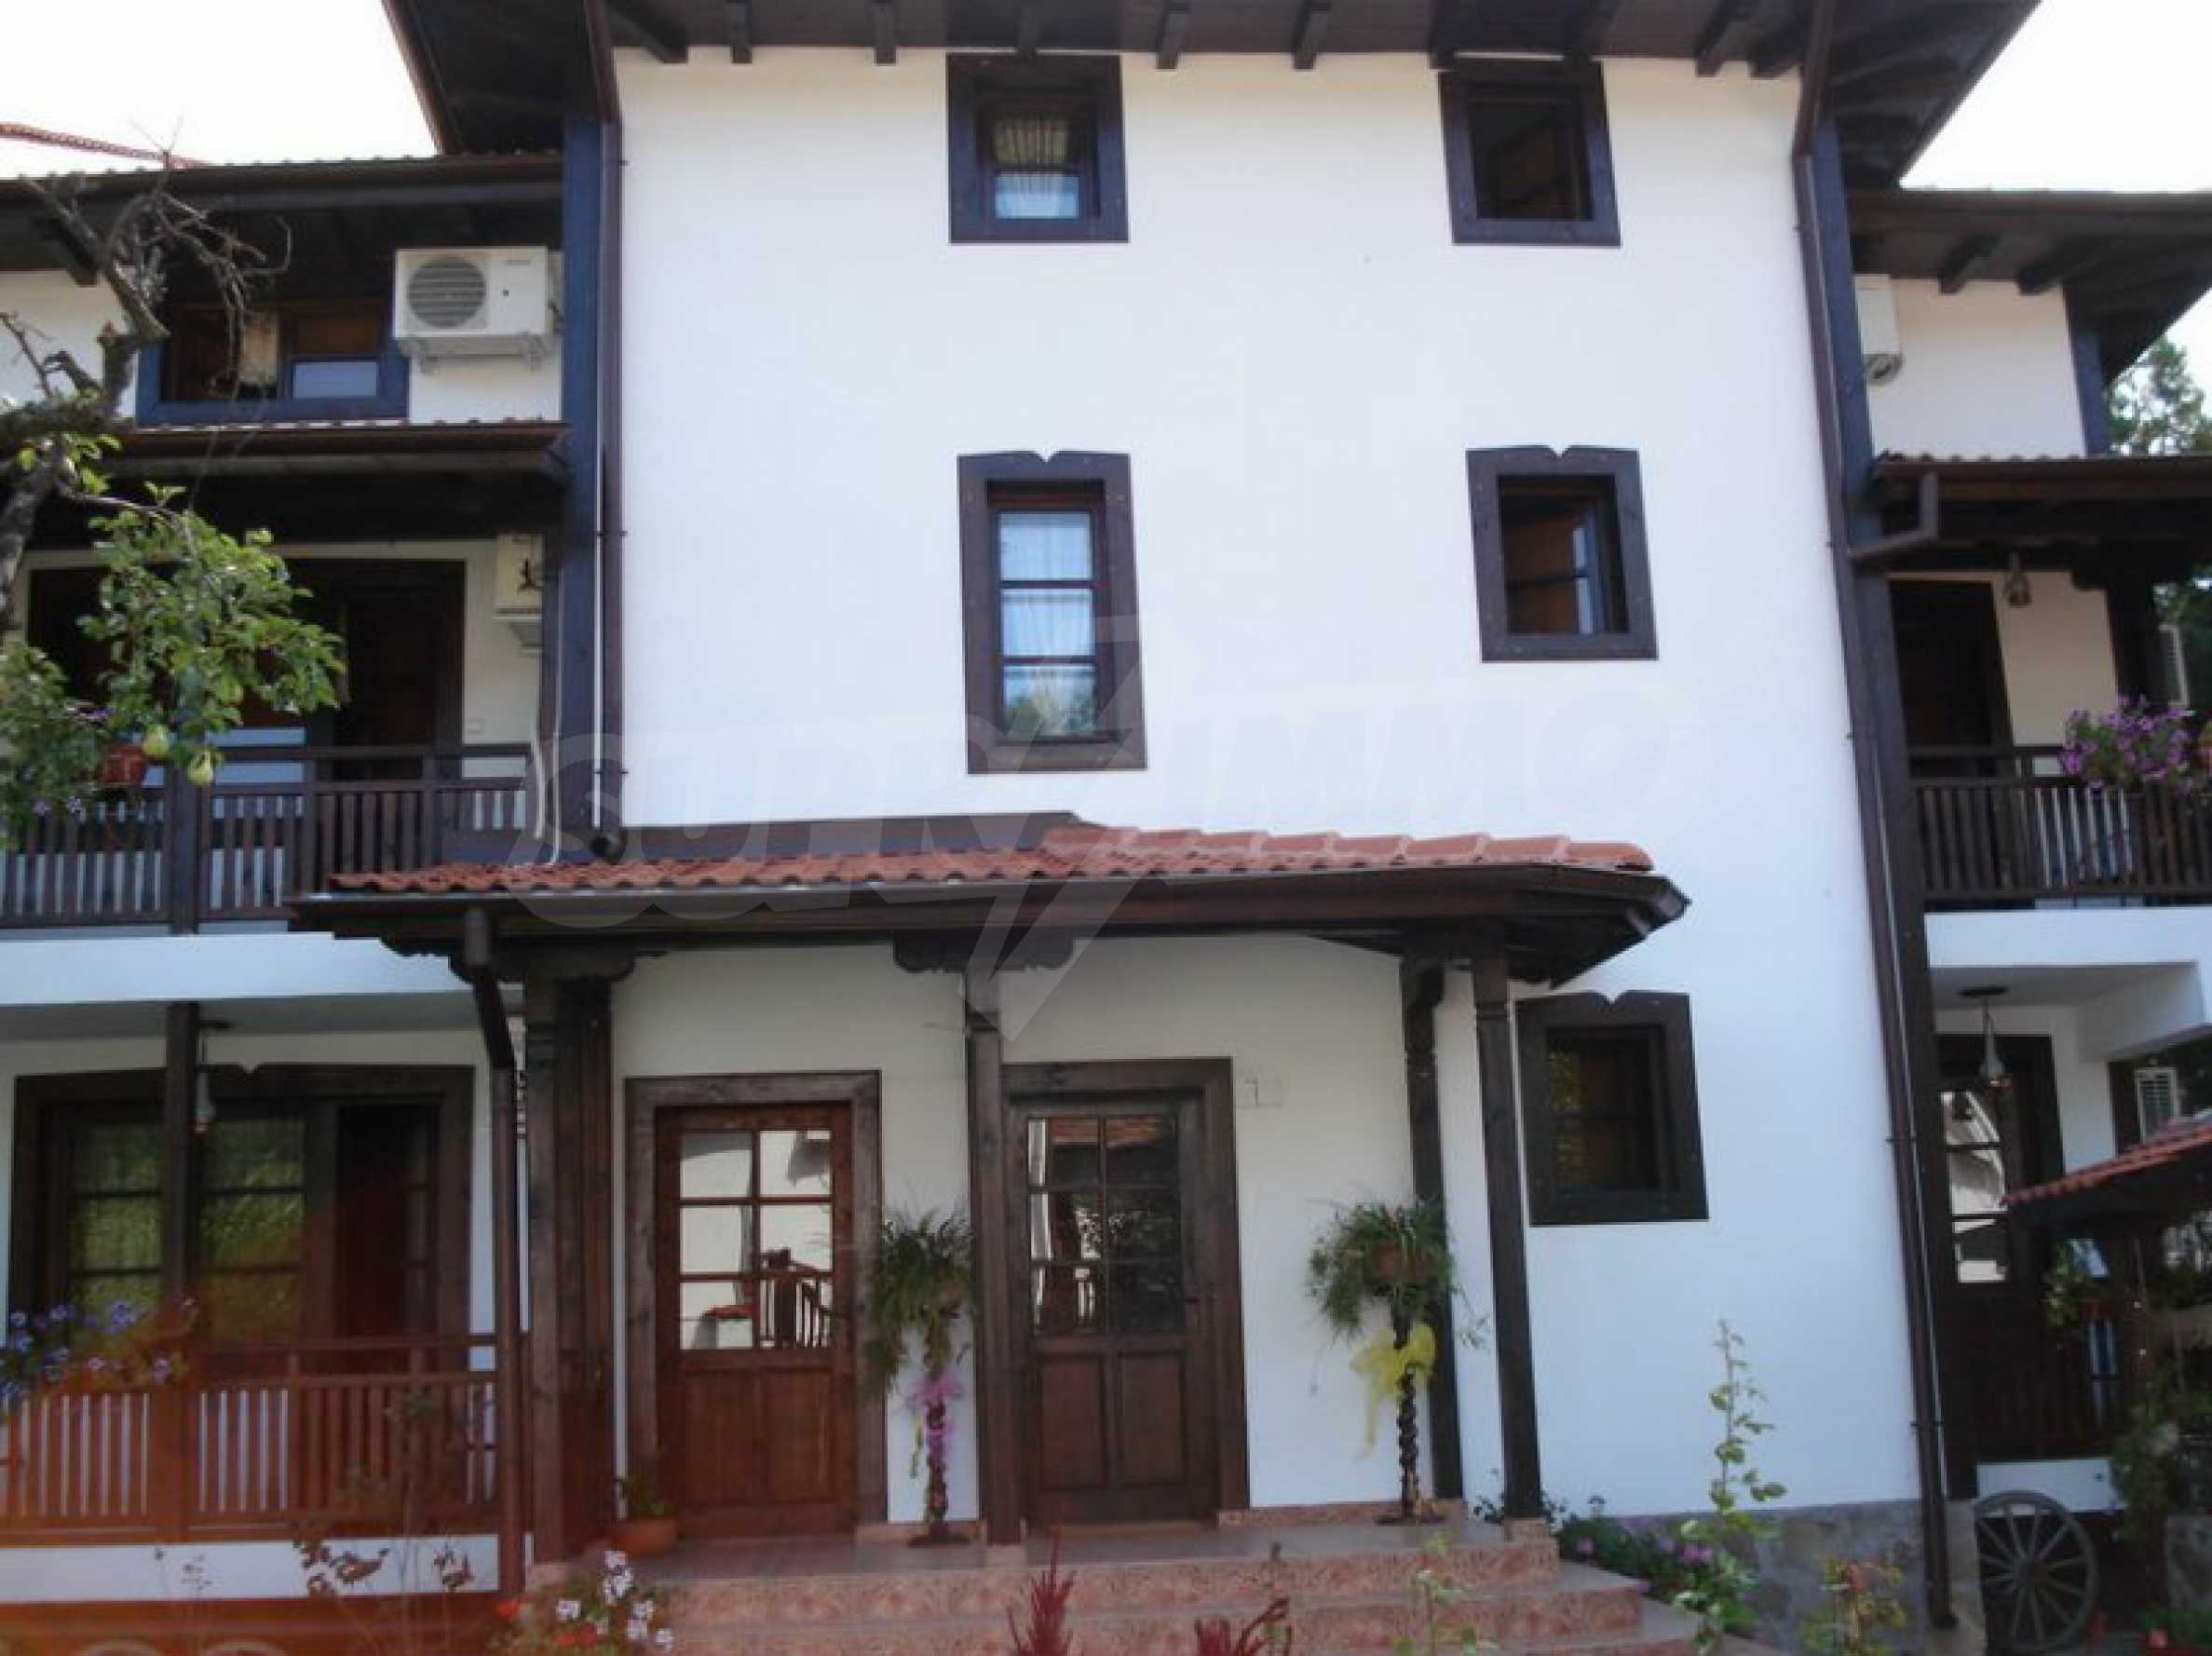 Hotelanlage mit Restaurant am Ufer des Flusses Osam in Lovech 21